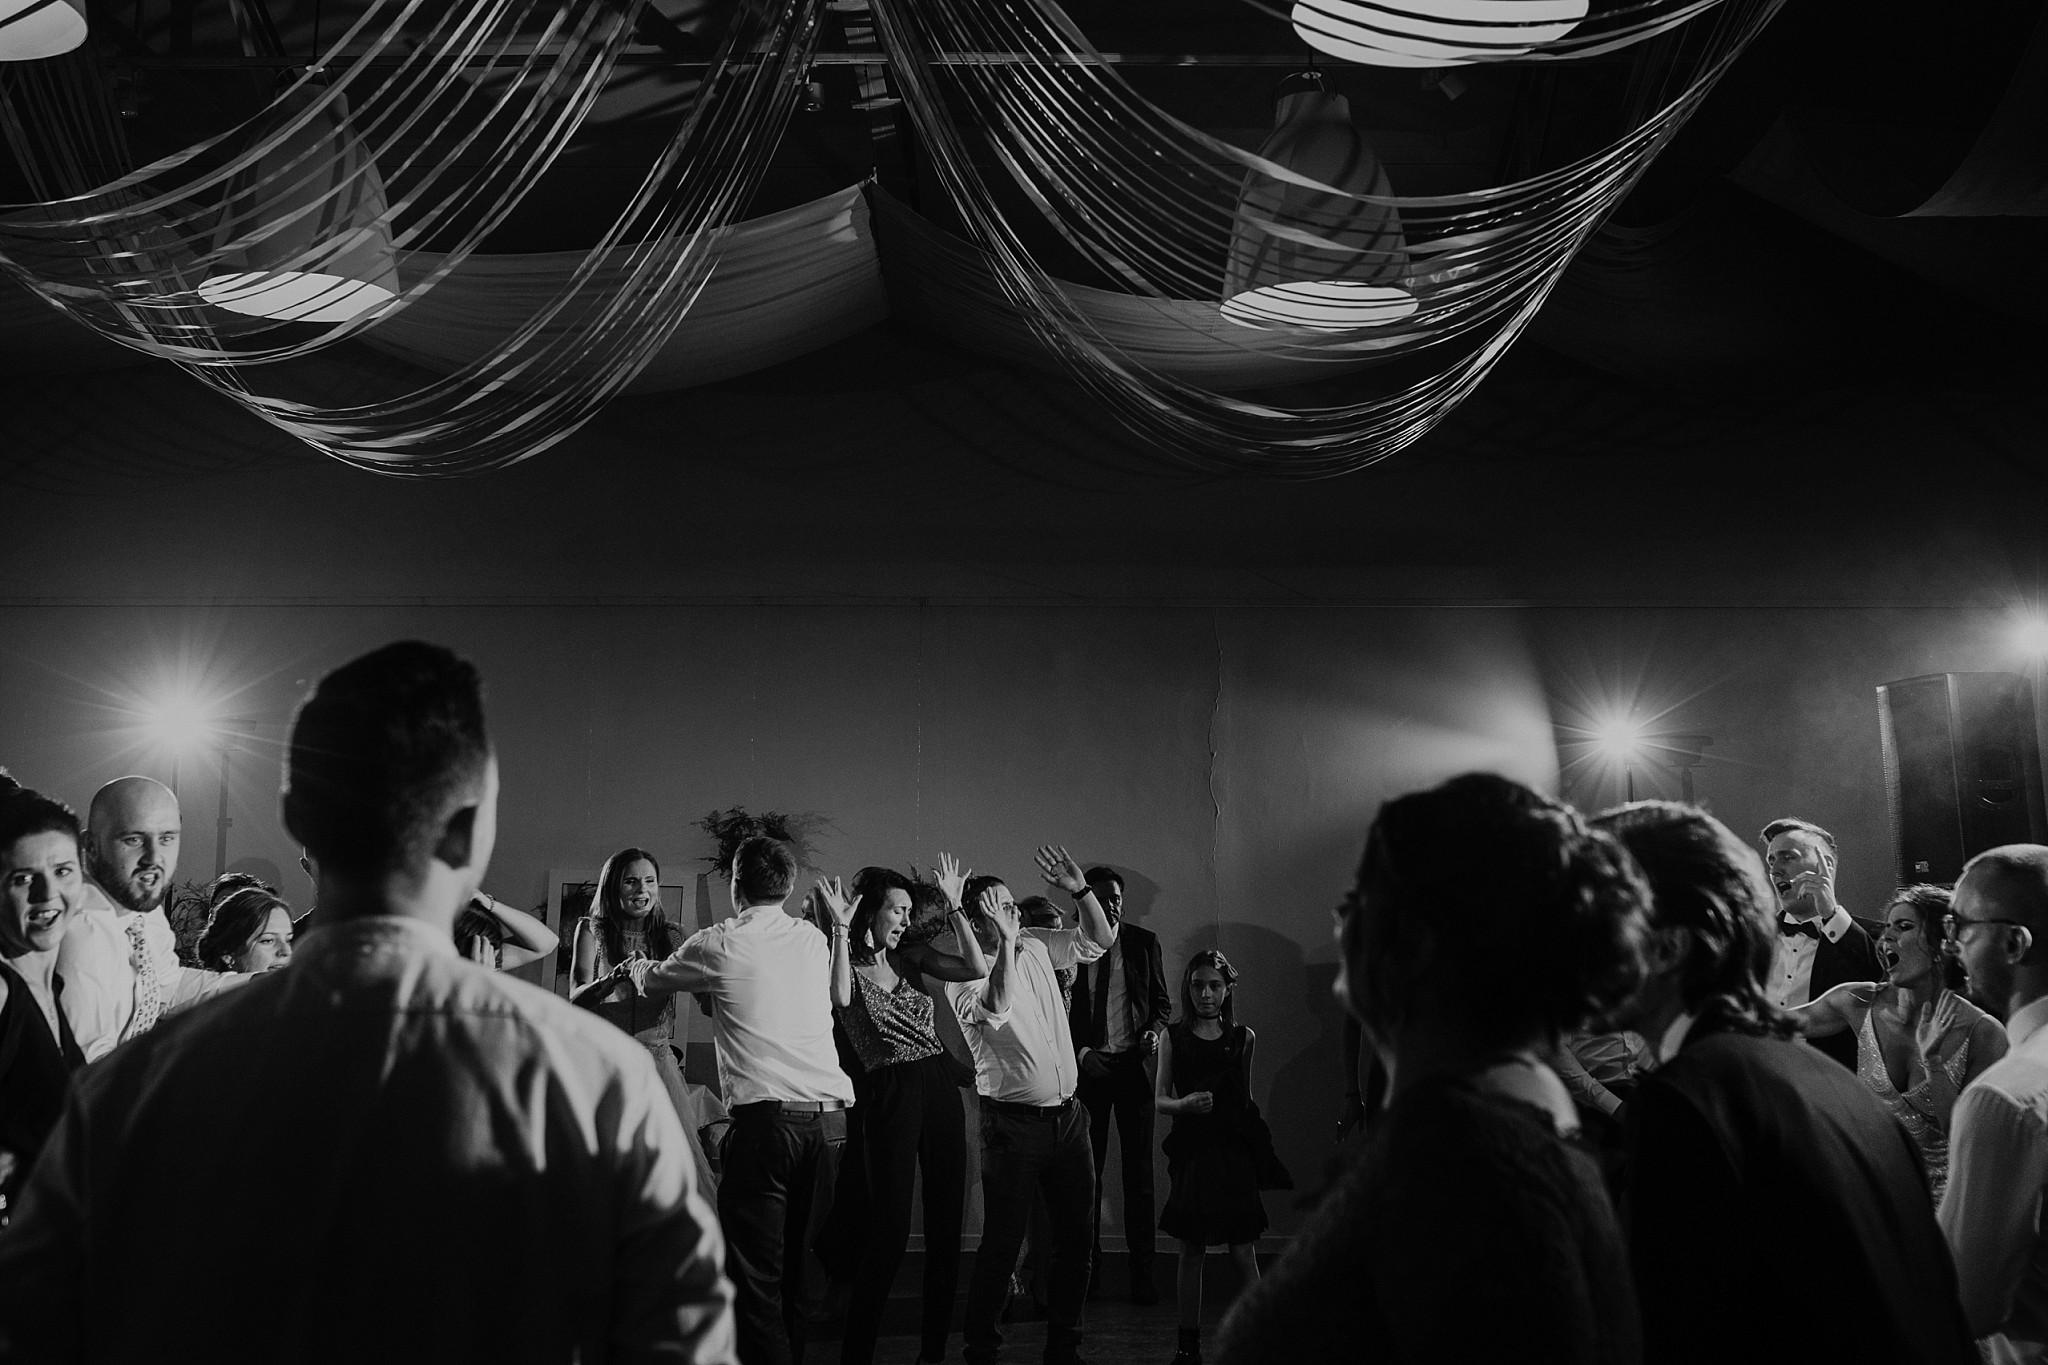 fotograf poznan wesele dobra truskawka piekne wesele pod poznaniem wesele w dobrej truskawce piekna para mloda slub marzen slub koronawirus slub listopad wesele koronawirus 420